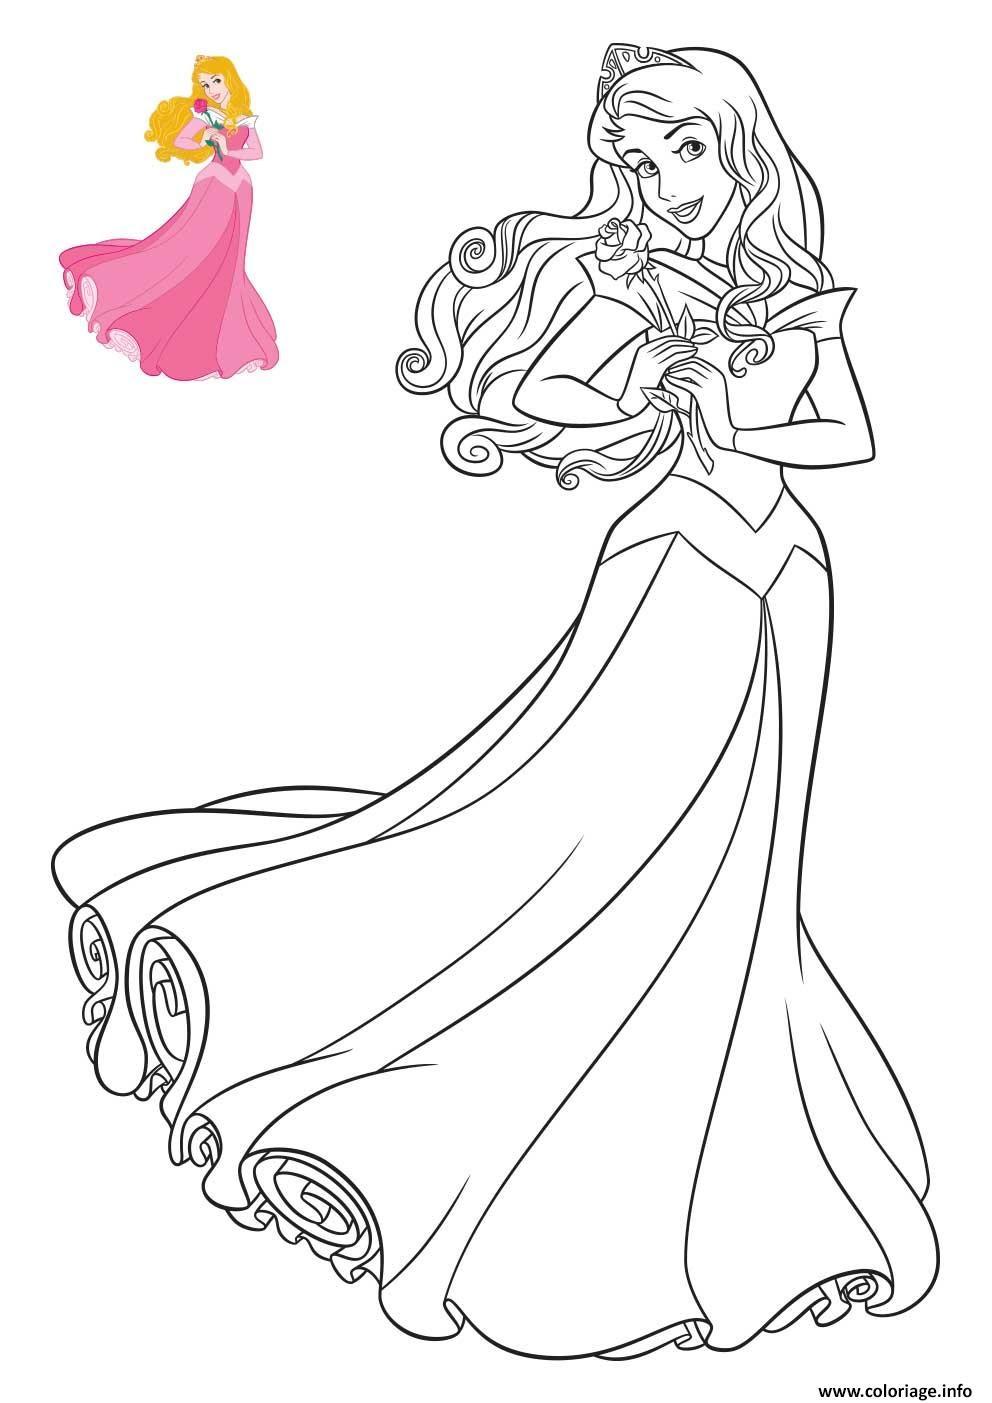 Coloriage Princesse Disney Aurore Jecoloriecom